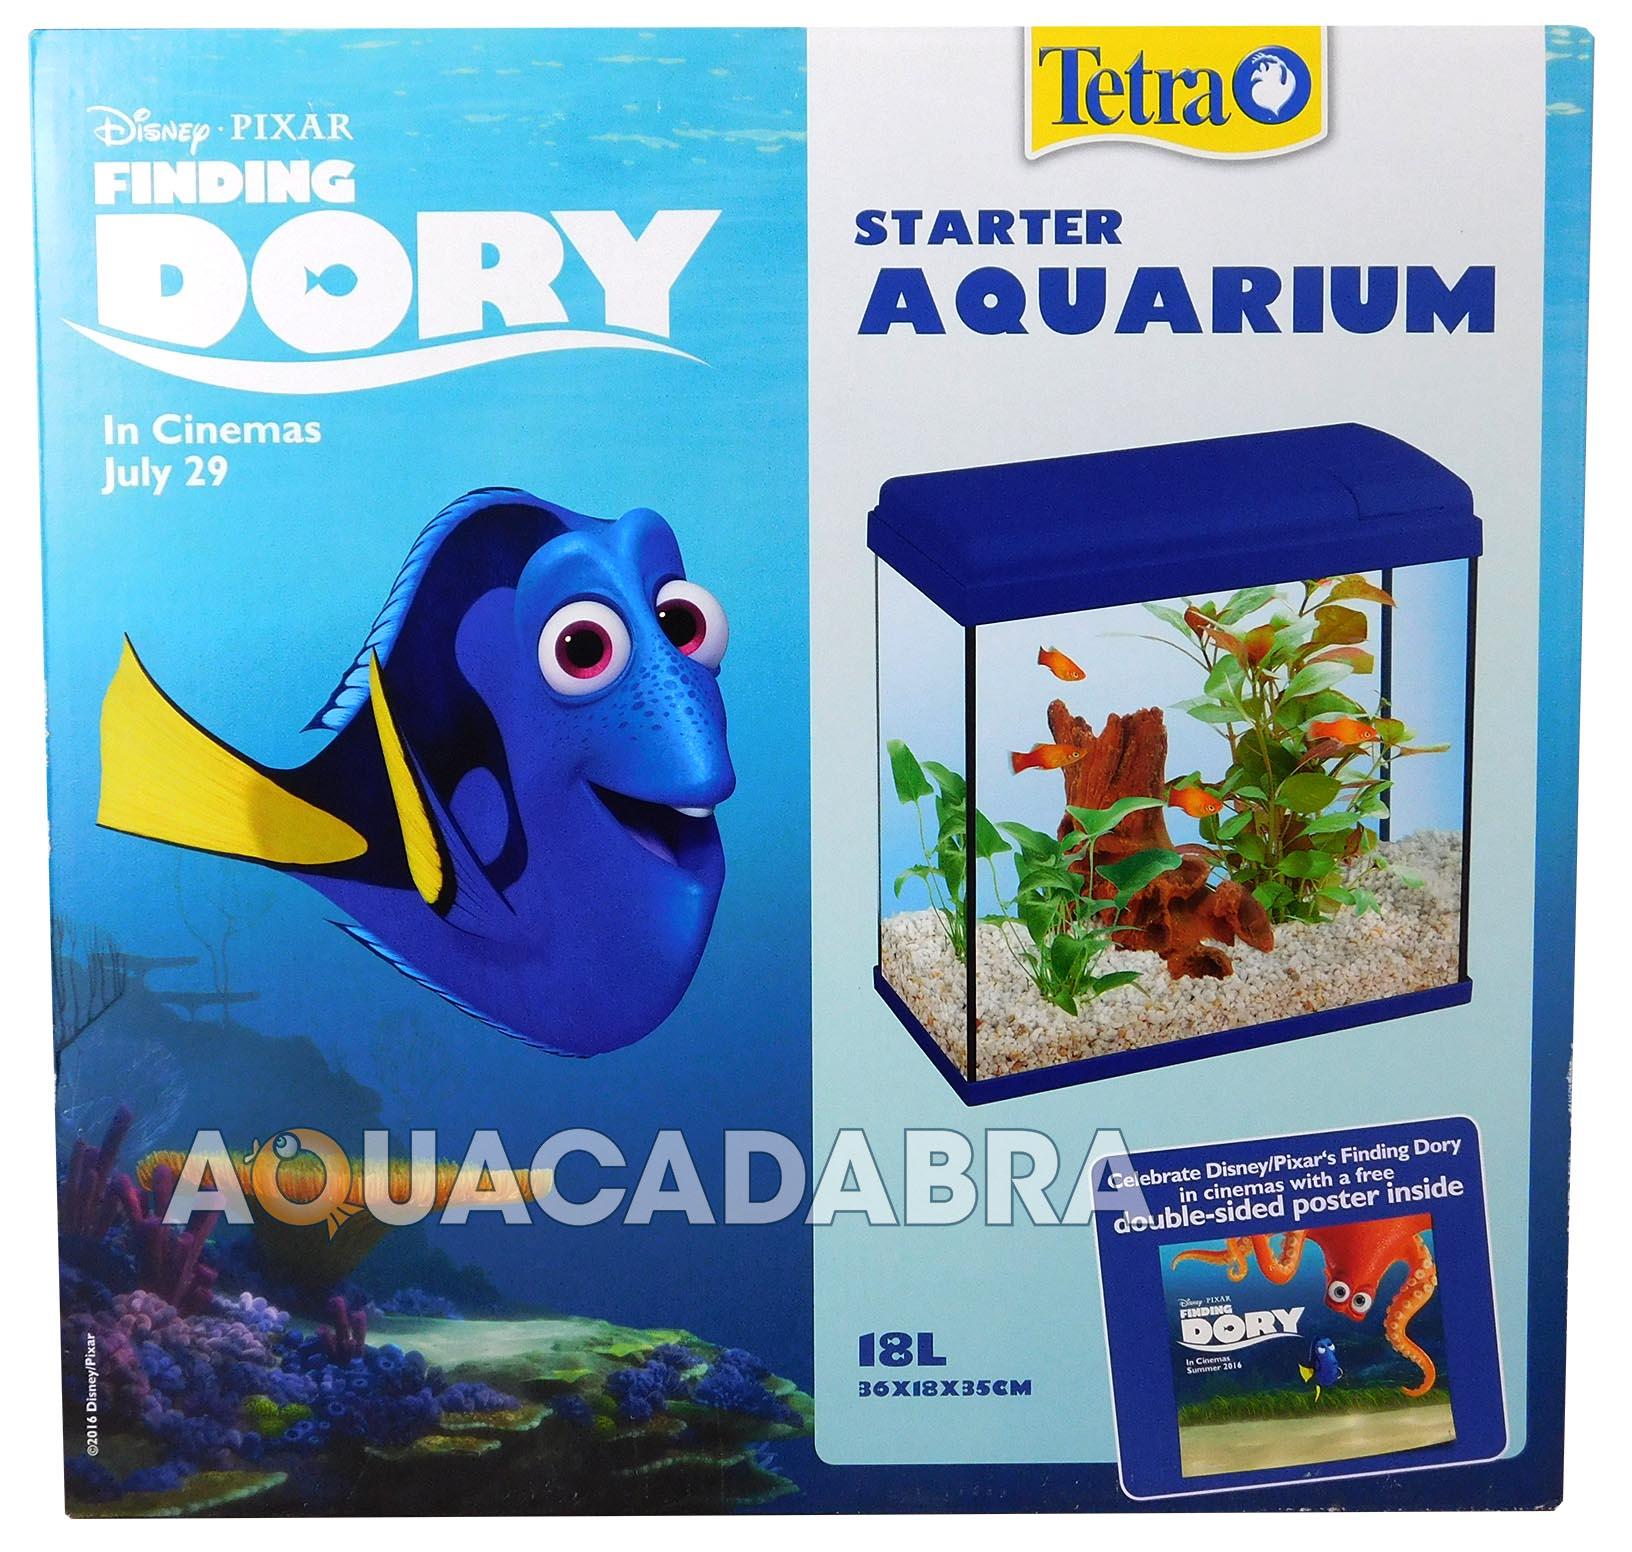 Disney finding dory 18l starter aquarium fish tank poster for Finding dory fish tank